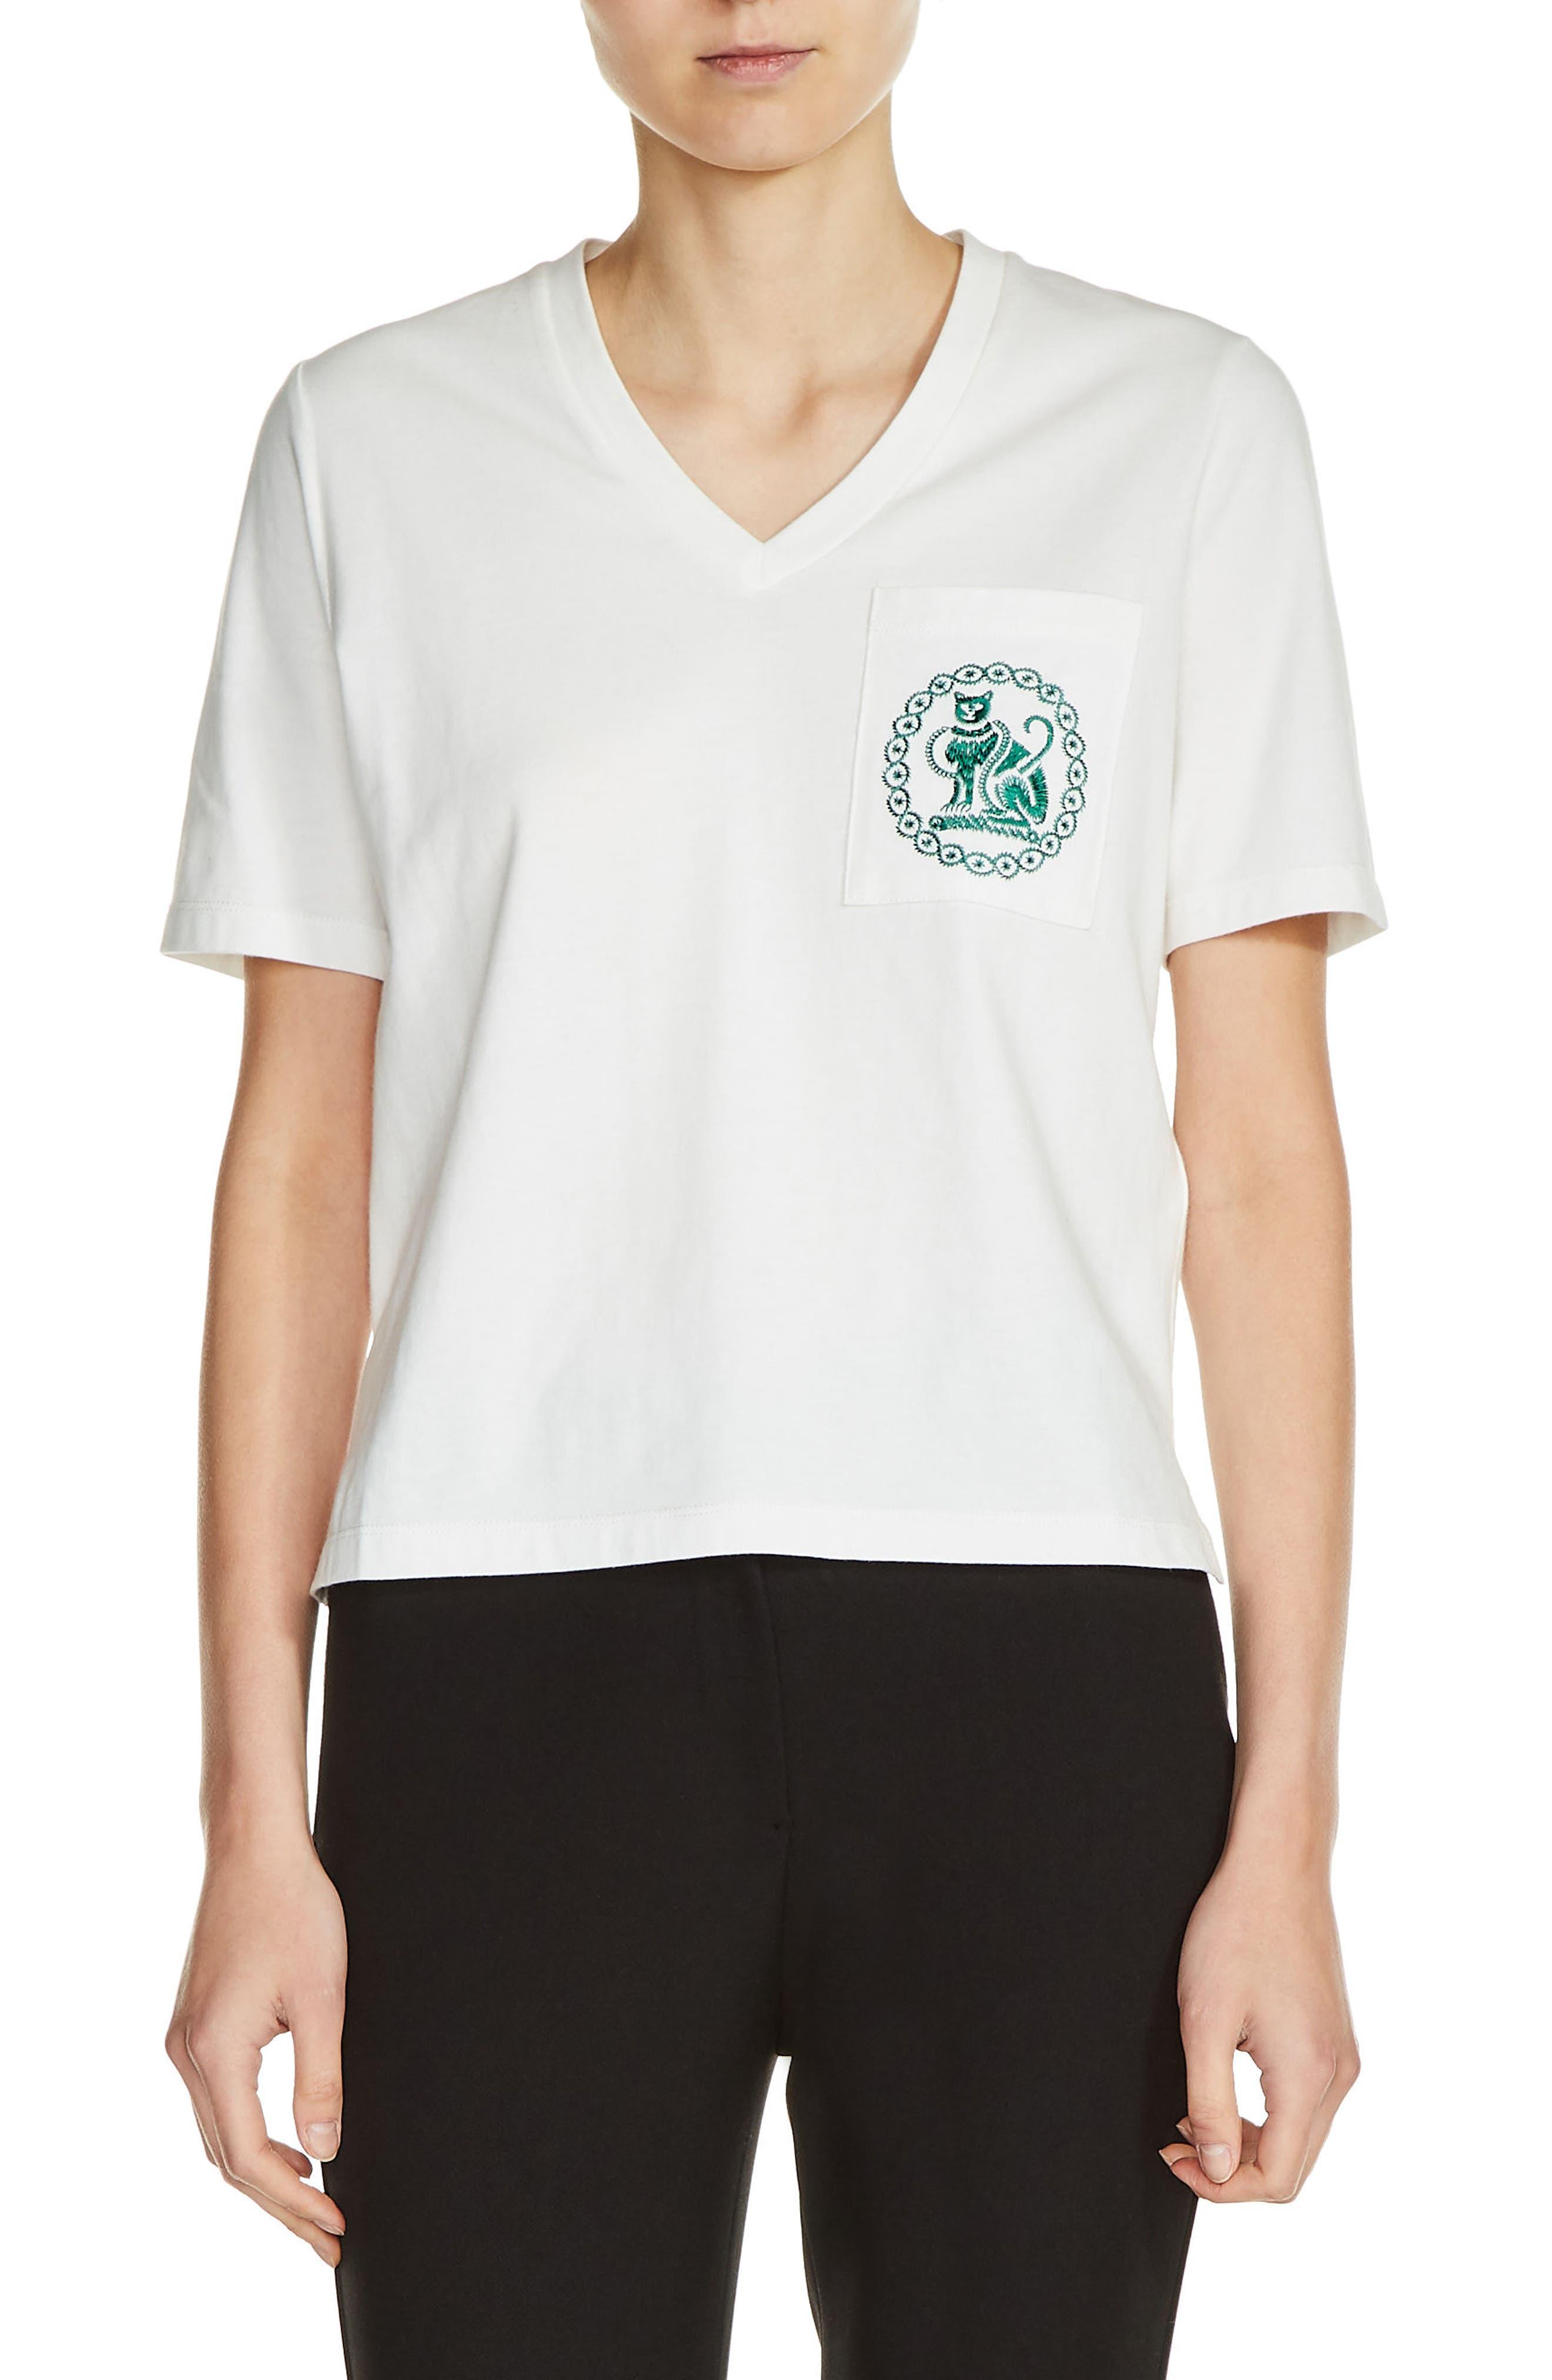 Main Image - maje Embroidered Cotton V-Neck Tee